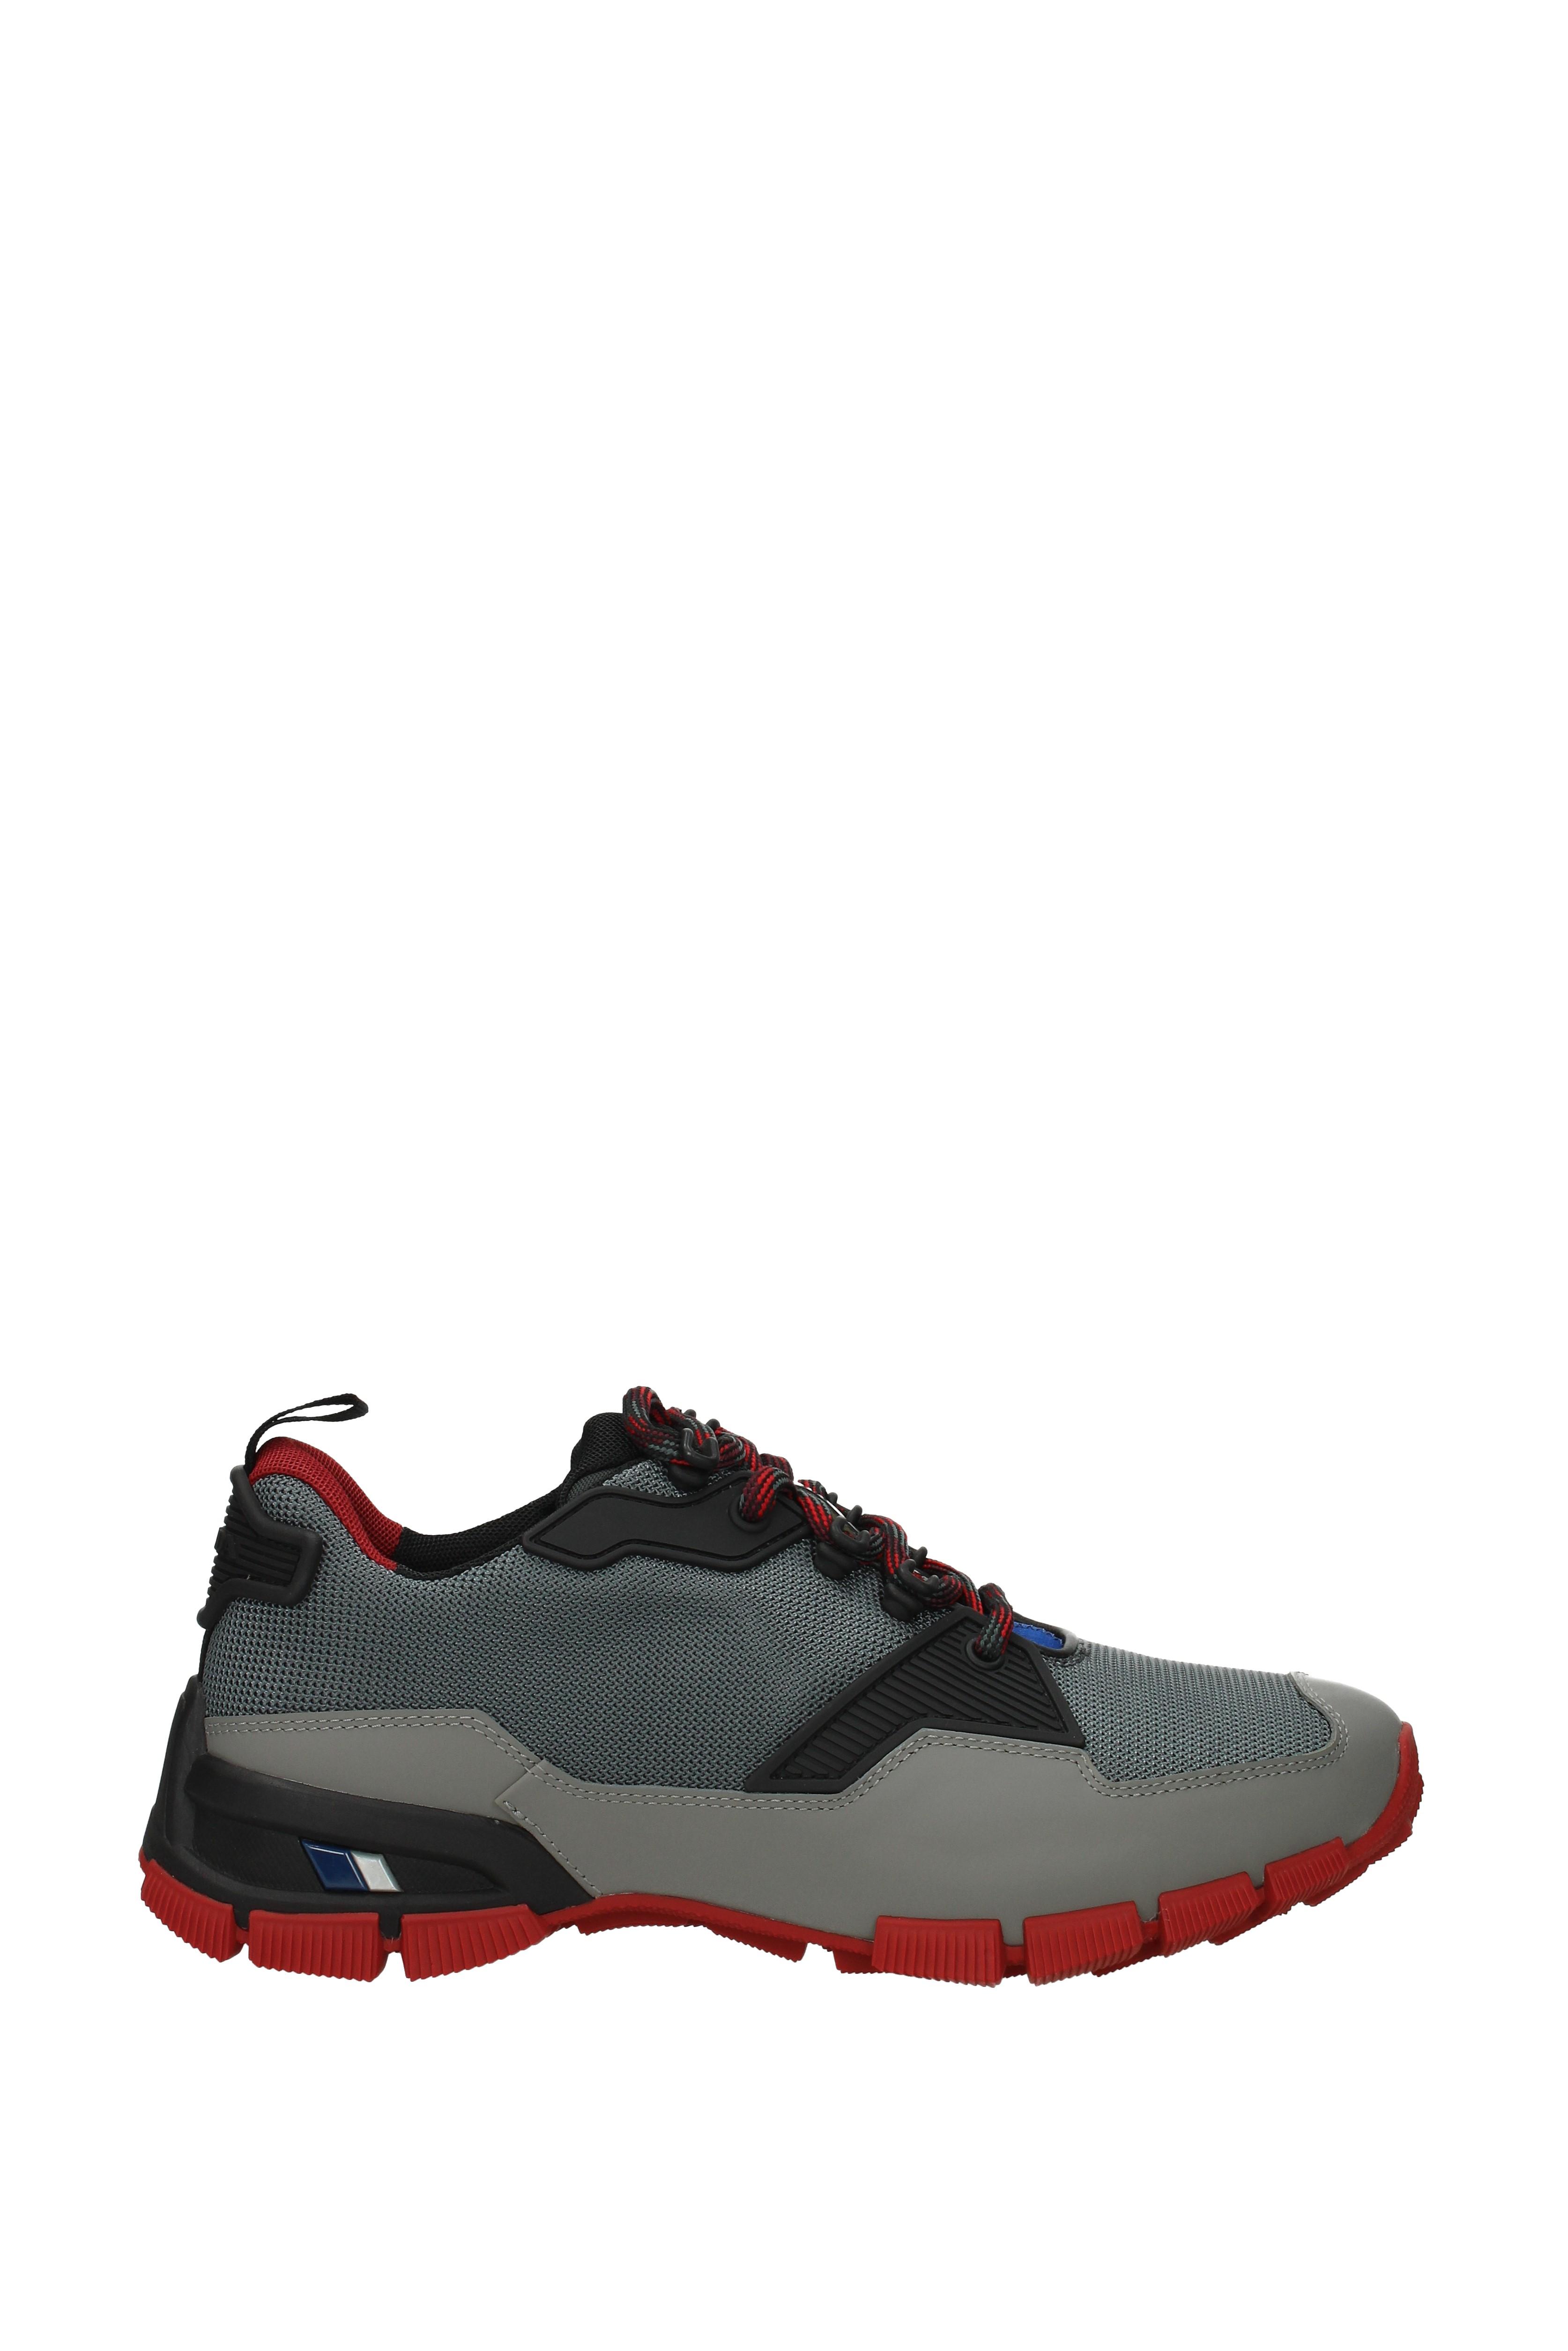 reputable site 2037f f8fcc ... Nike Blazer High Tops Trainers – Size 4 UK UK UK – Good Worn Condition  4cdb7f ...